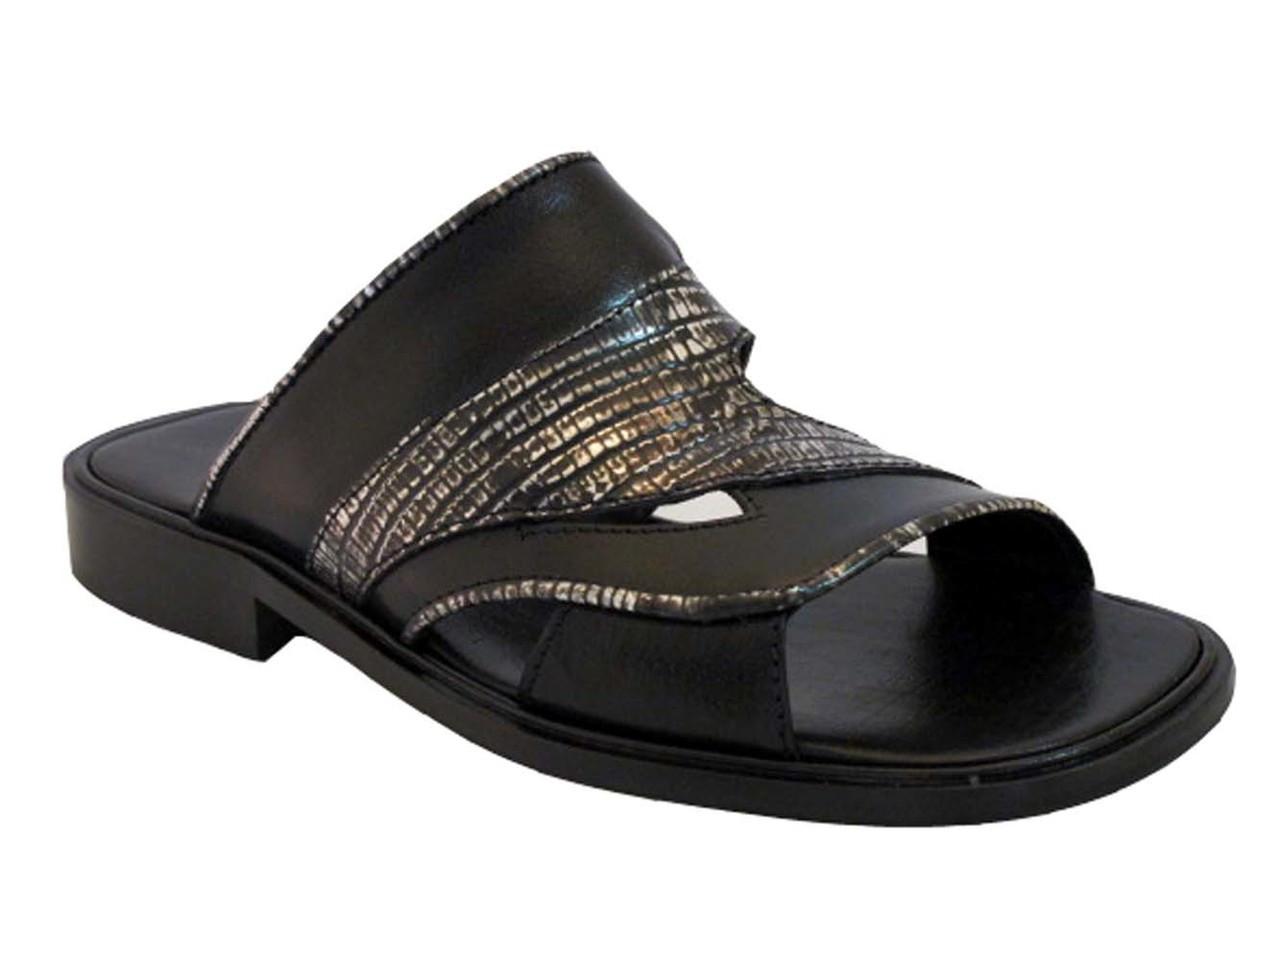 824d49026 Davinci 3936 Men s Italian Slip On Leather Woven Sandals Black